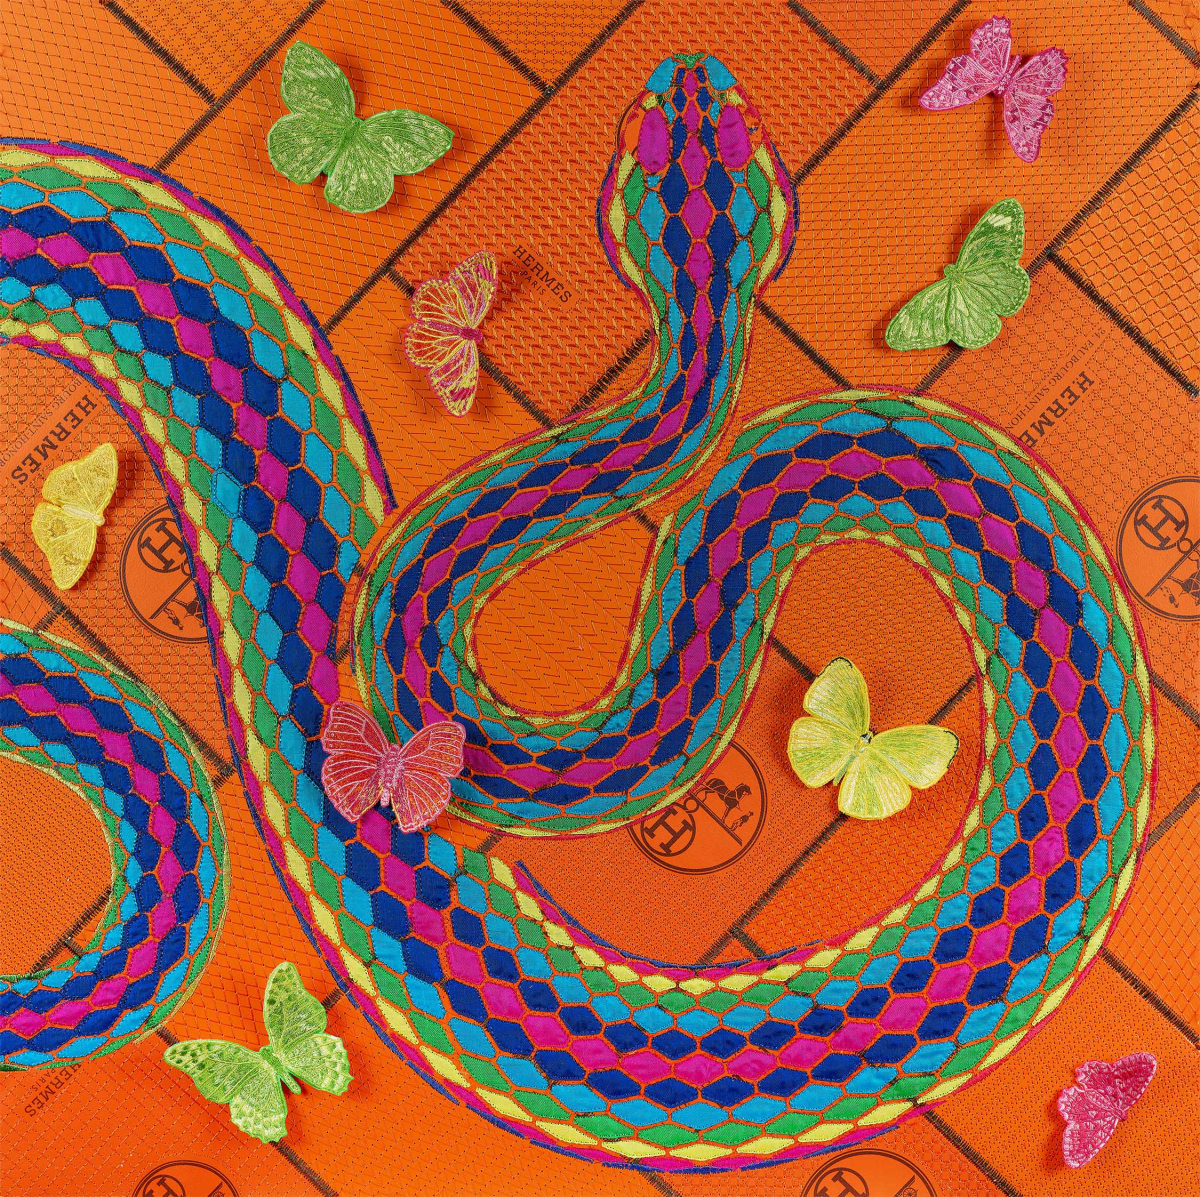 Stephen Wilson, Neon Serpent, 2020